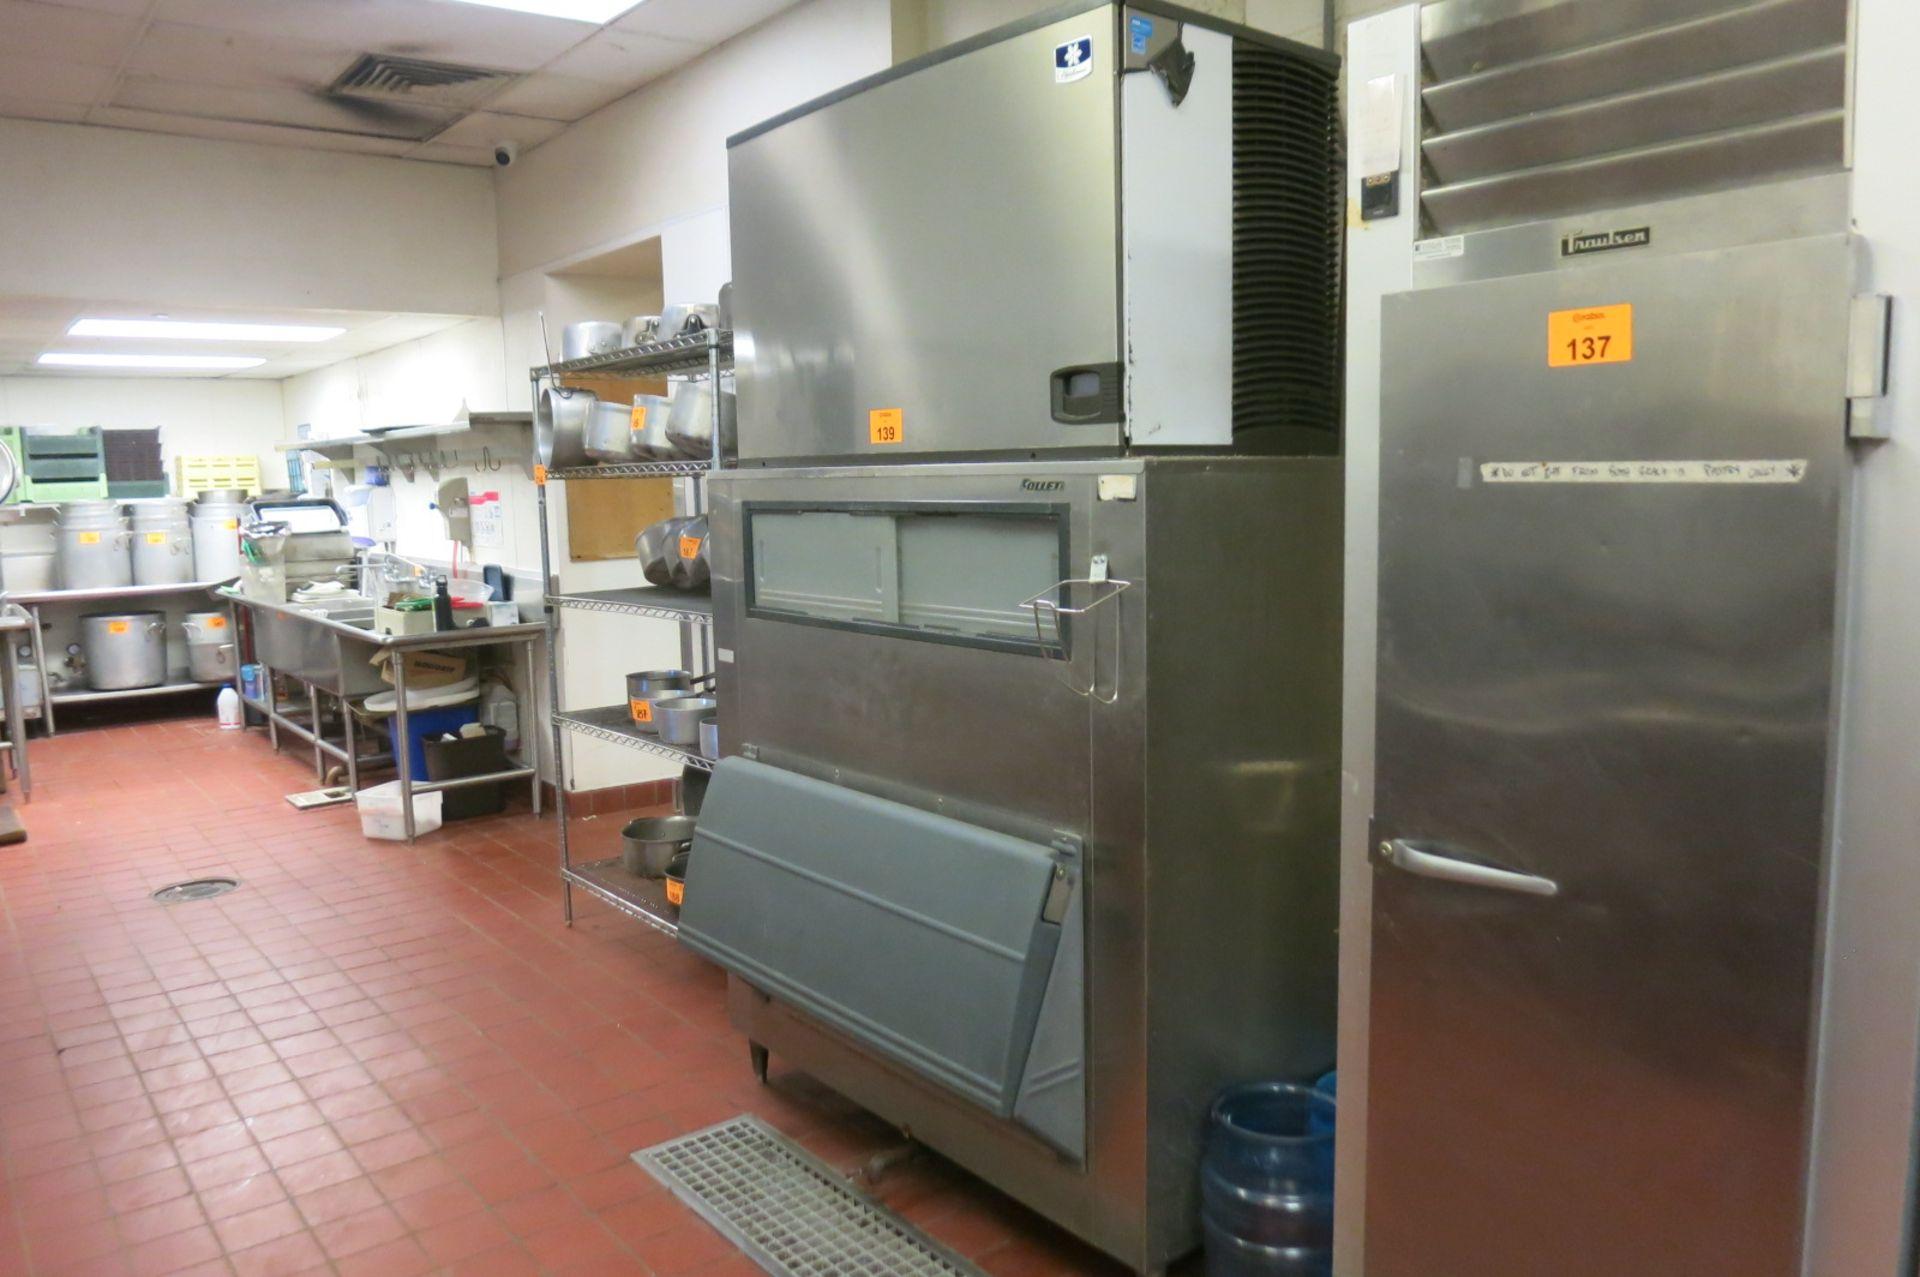 Chest Freezer - Image 2 of 2